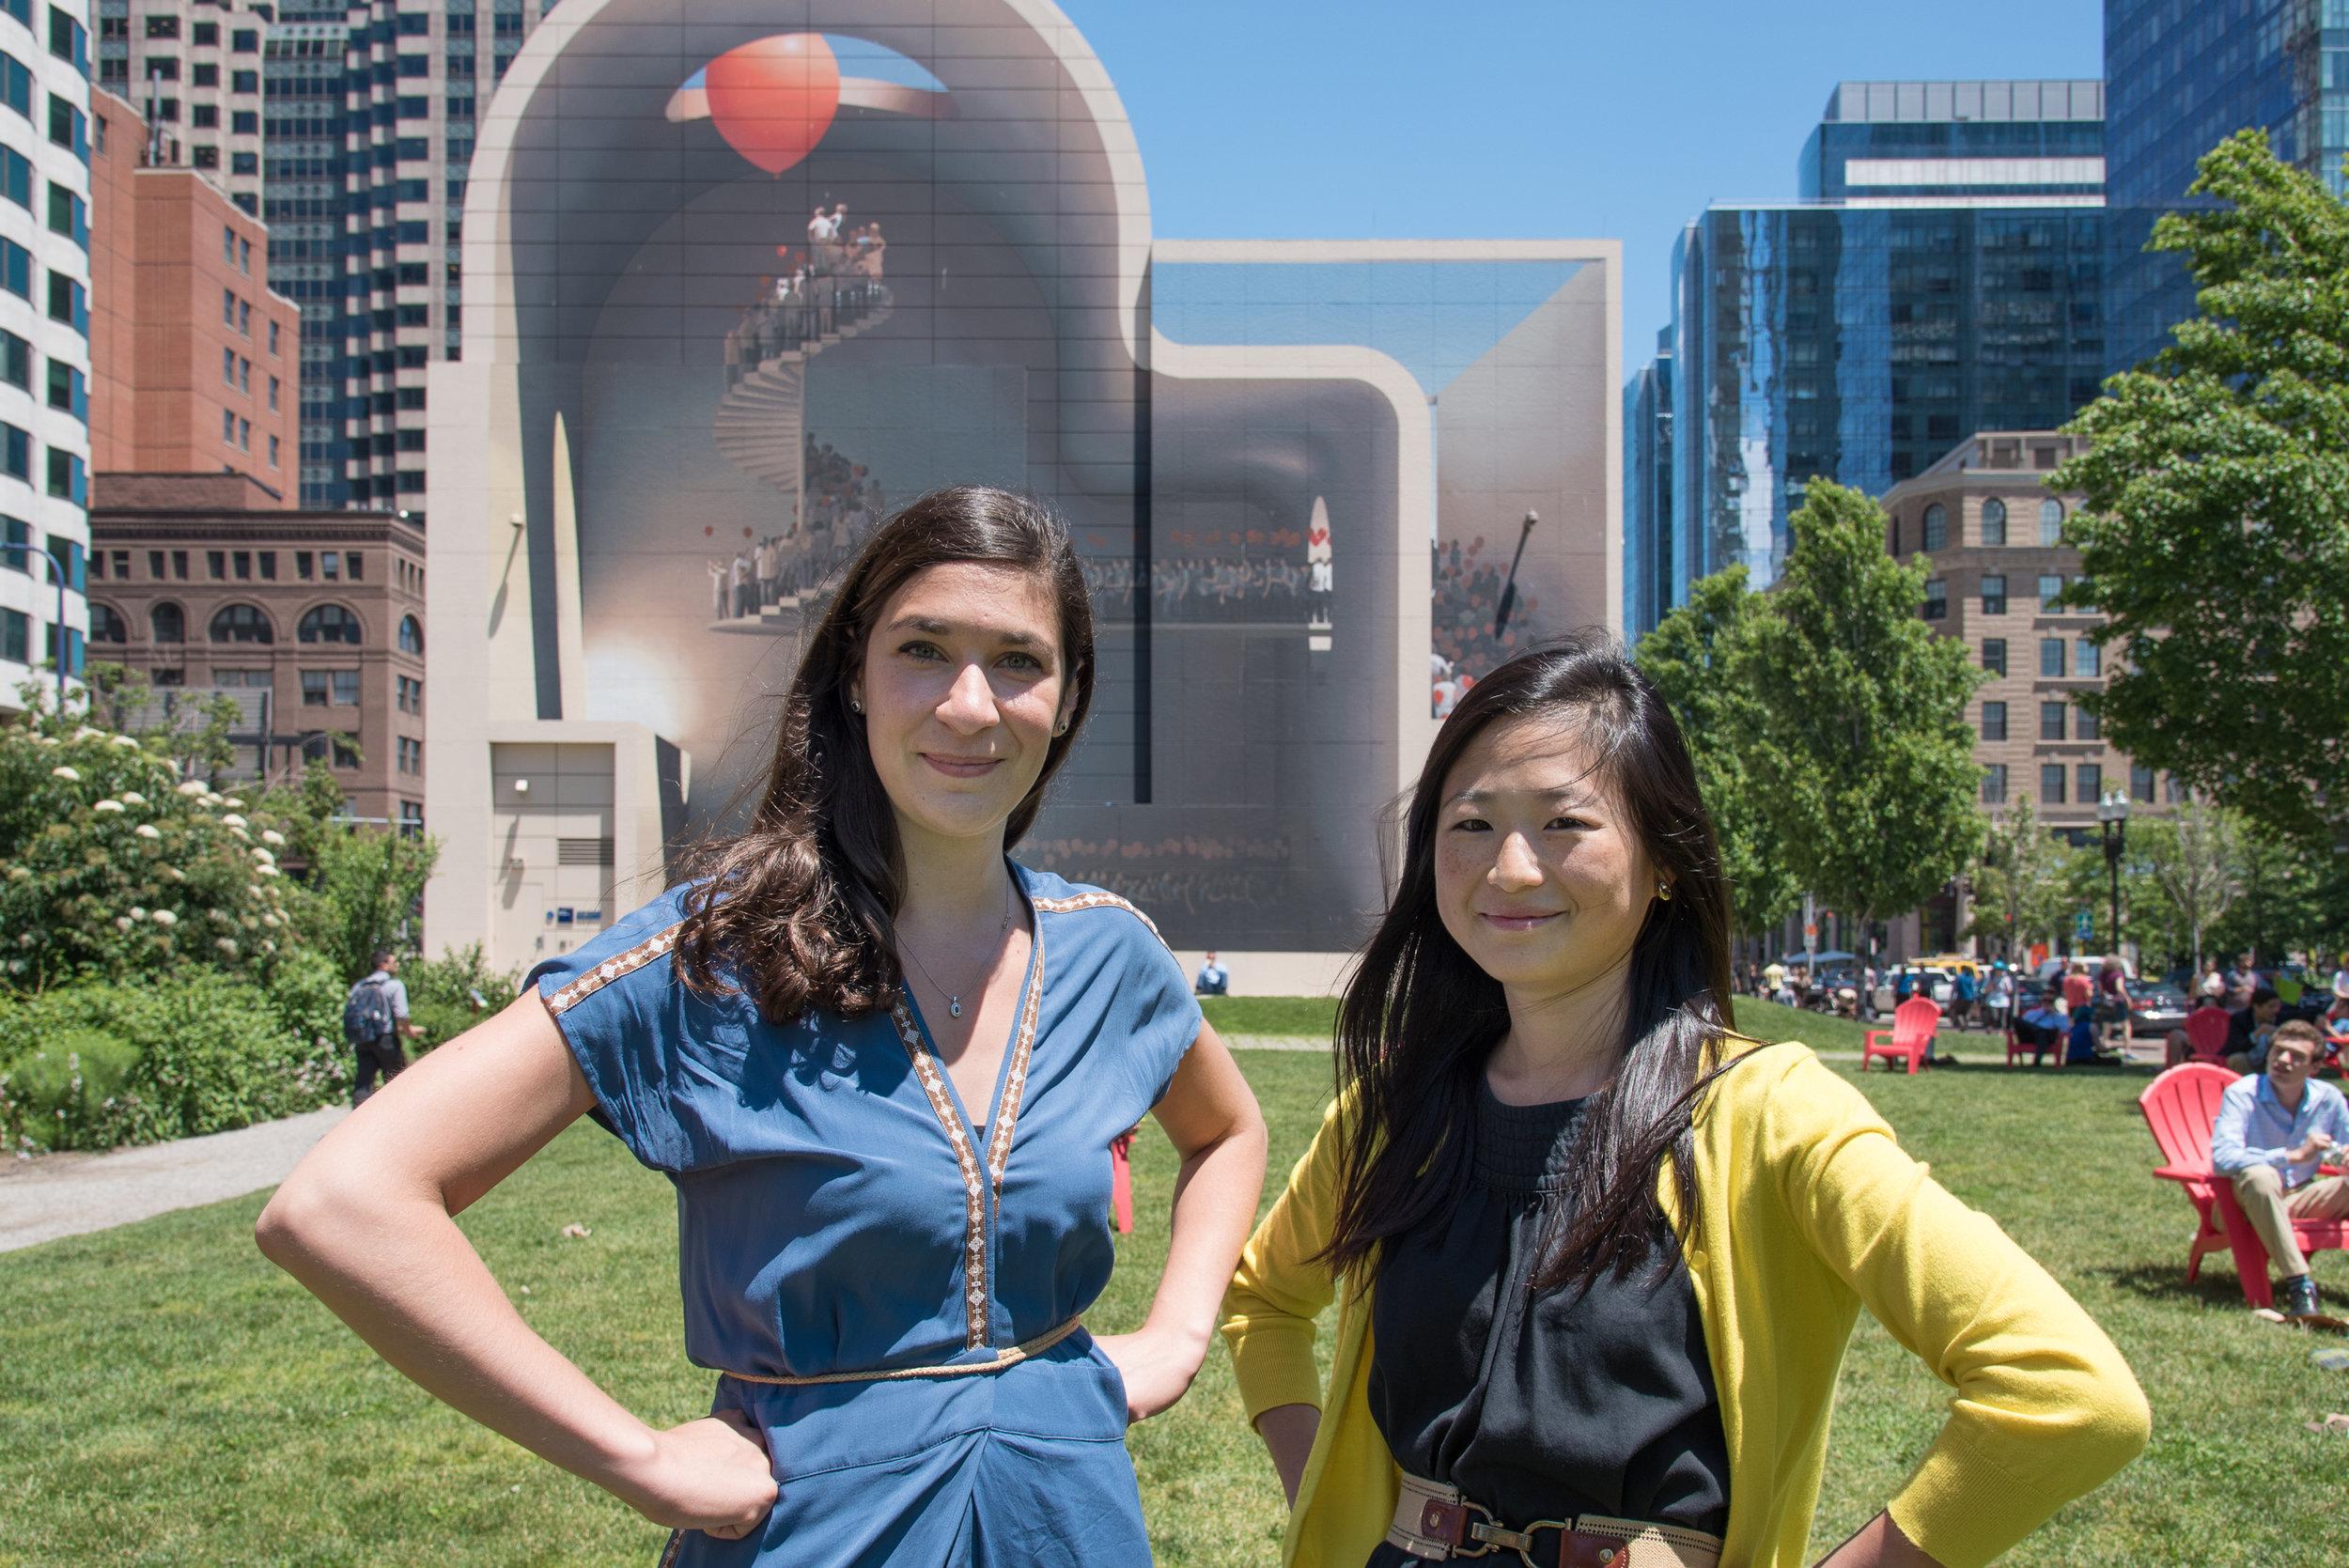 Zhanina Boyadzhieva & Juliet Chun (Founders of Girl UNinterrupted Project)  Photo Credit: Langer Hsu